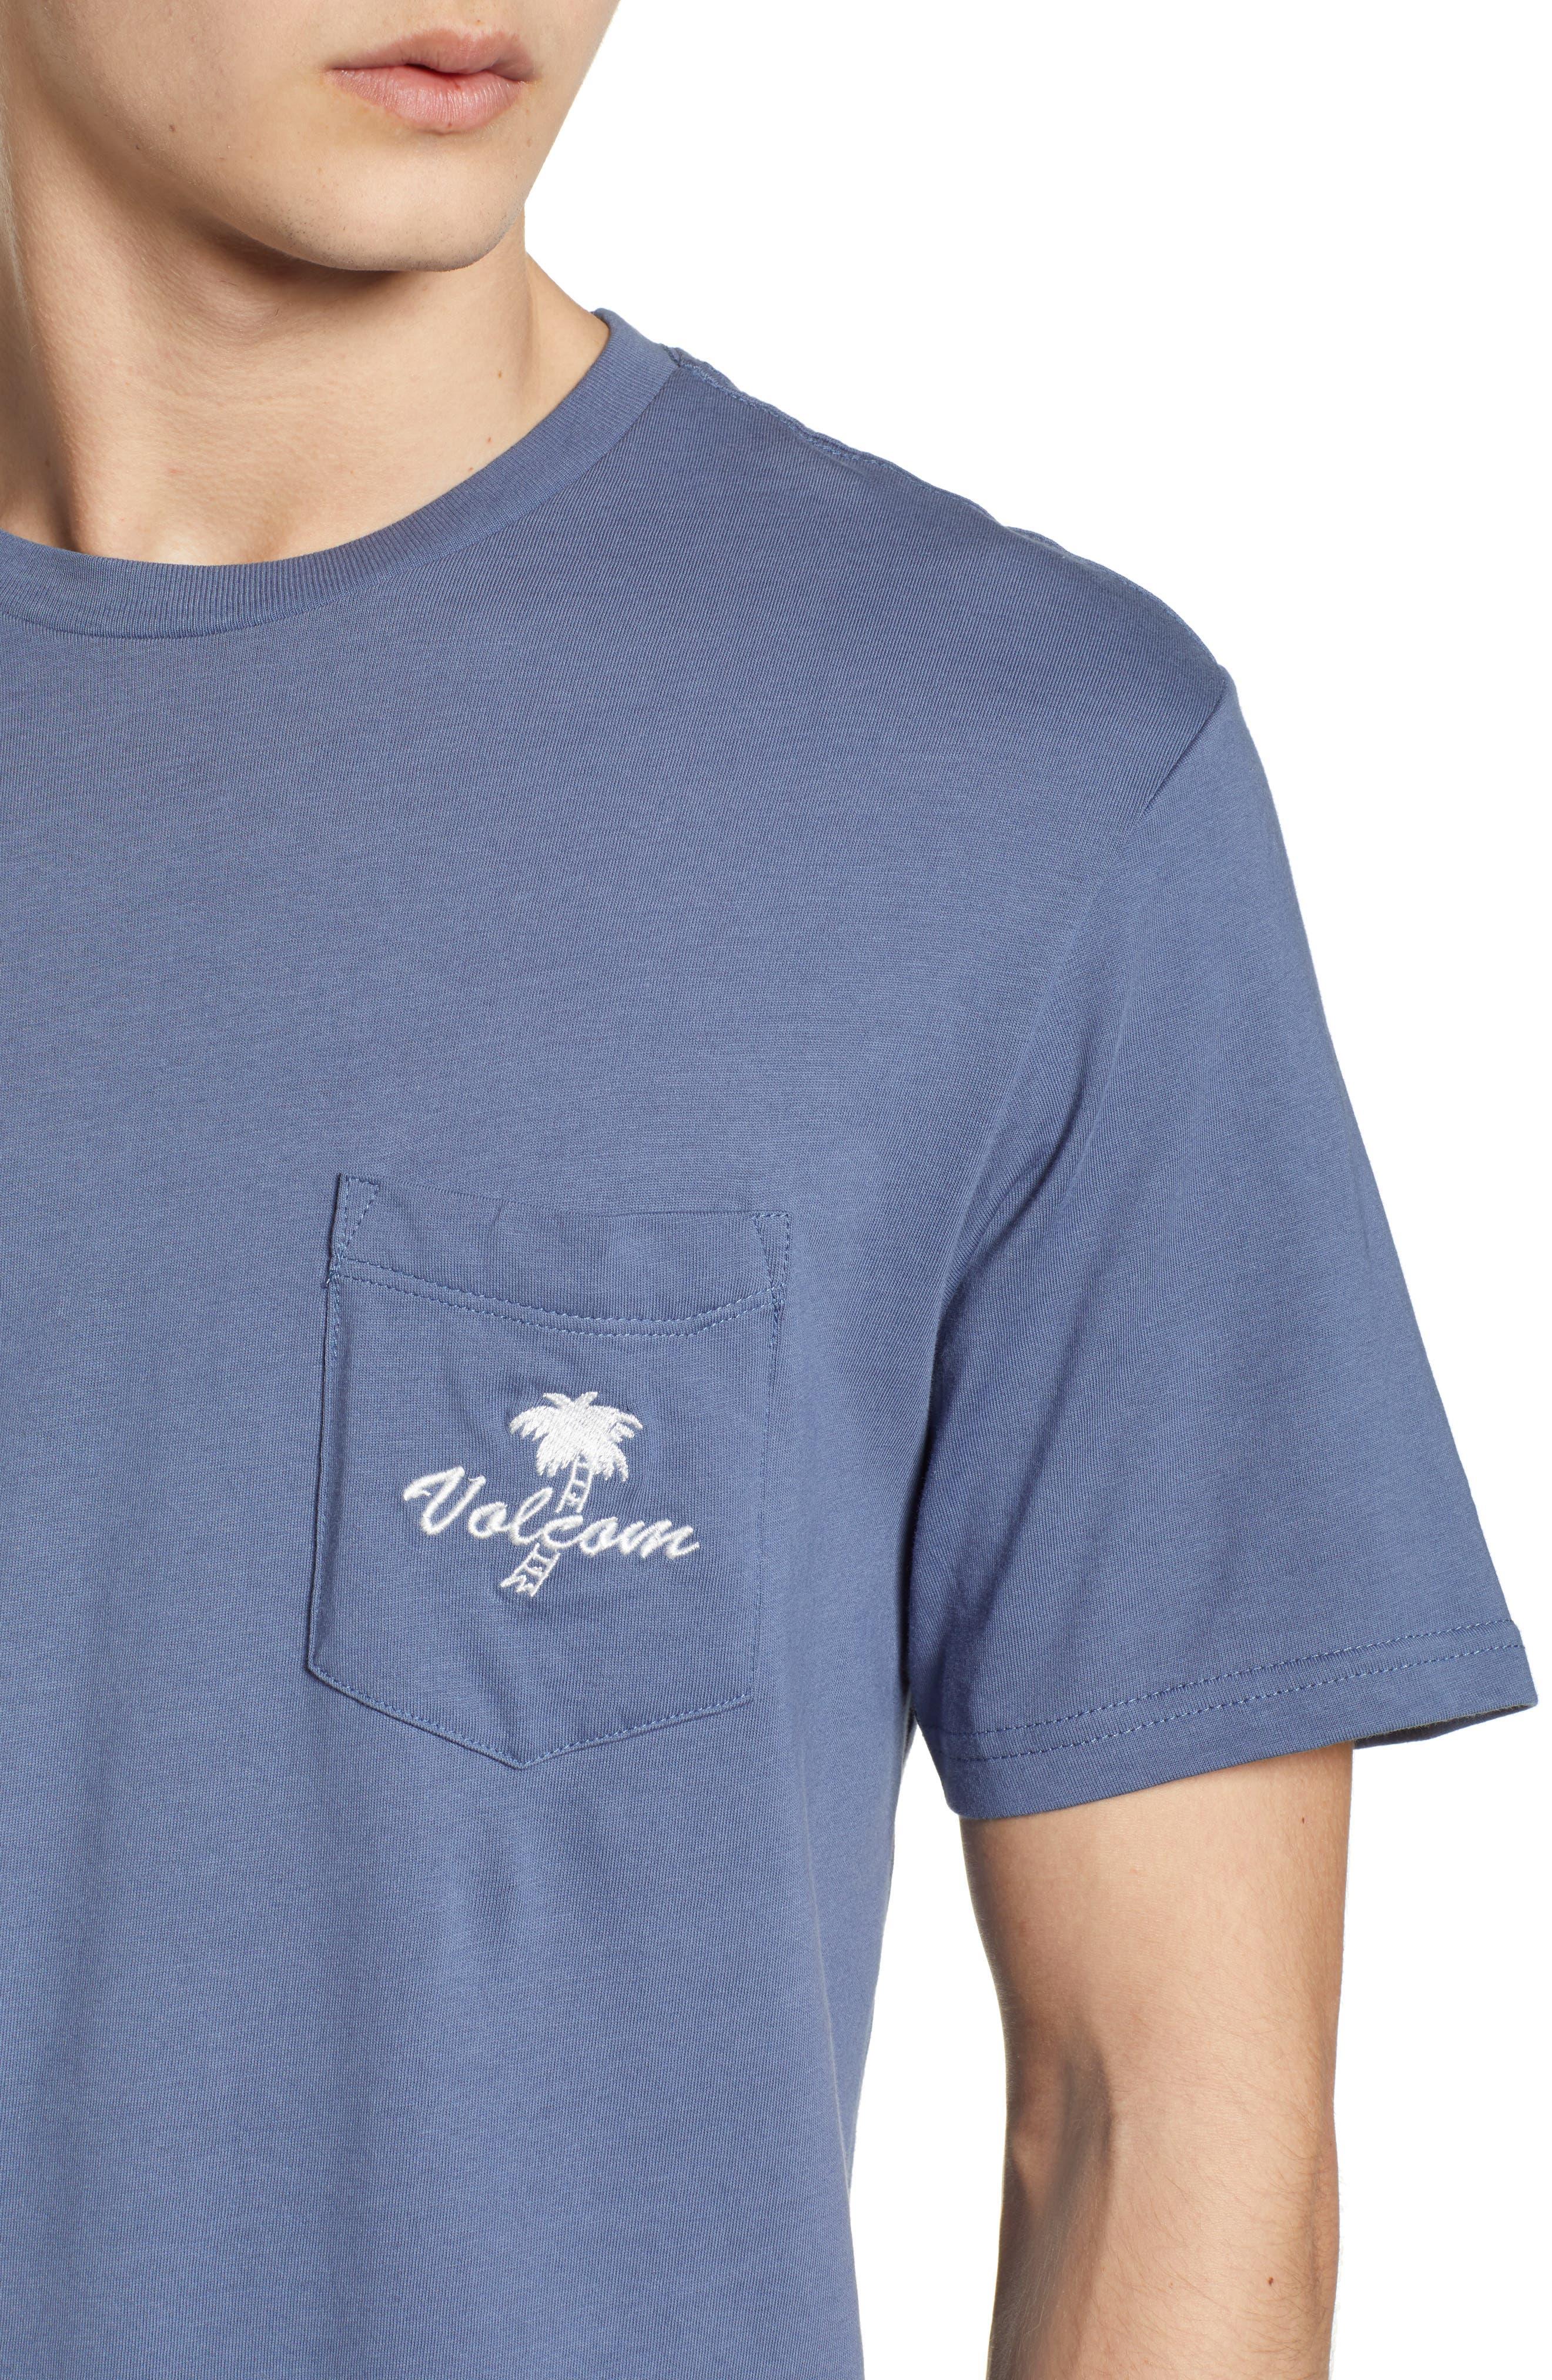 Last Resort Pocket T-Shirt,                             Alternate thumbnail 4, color,                             Deep Blue